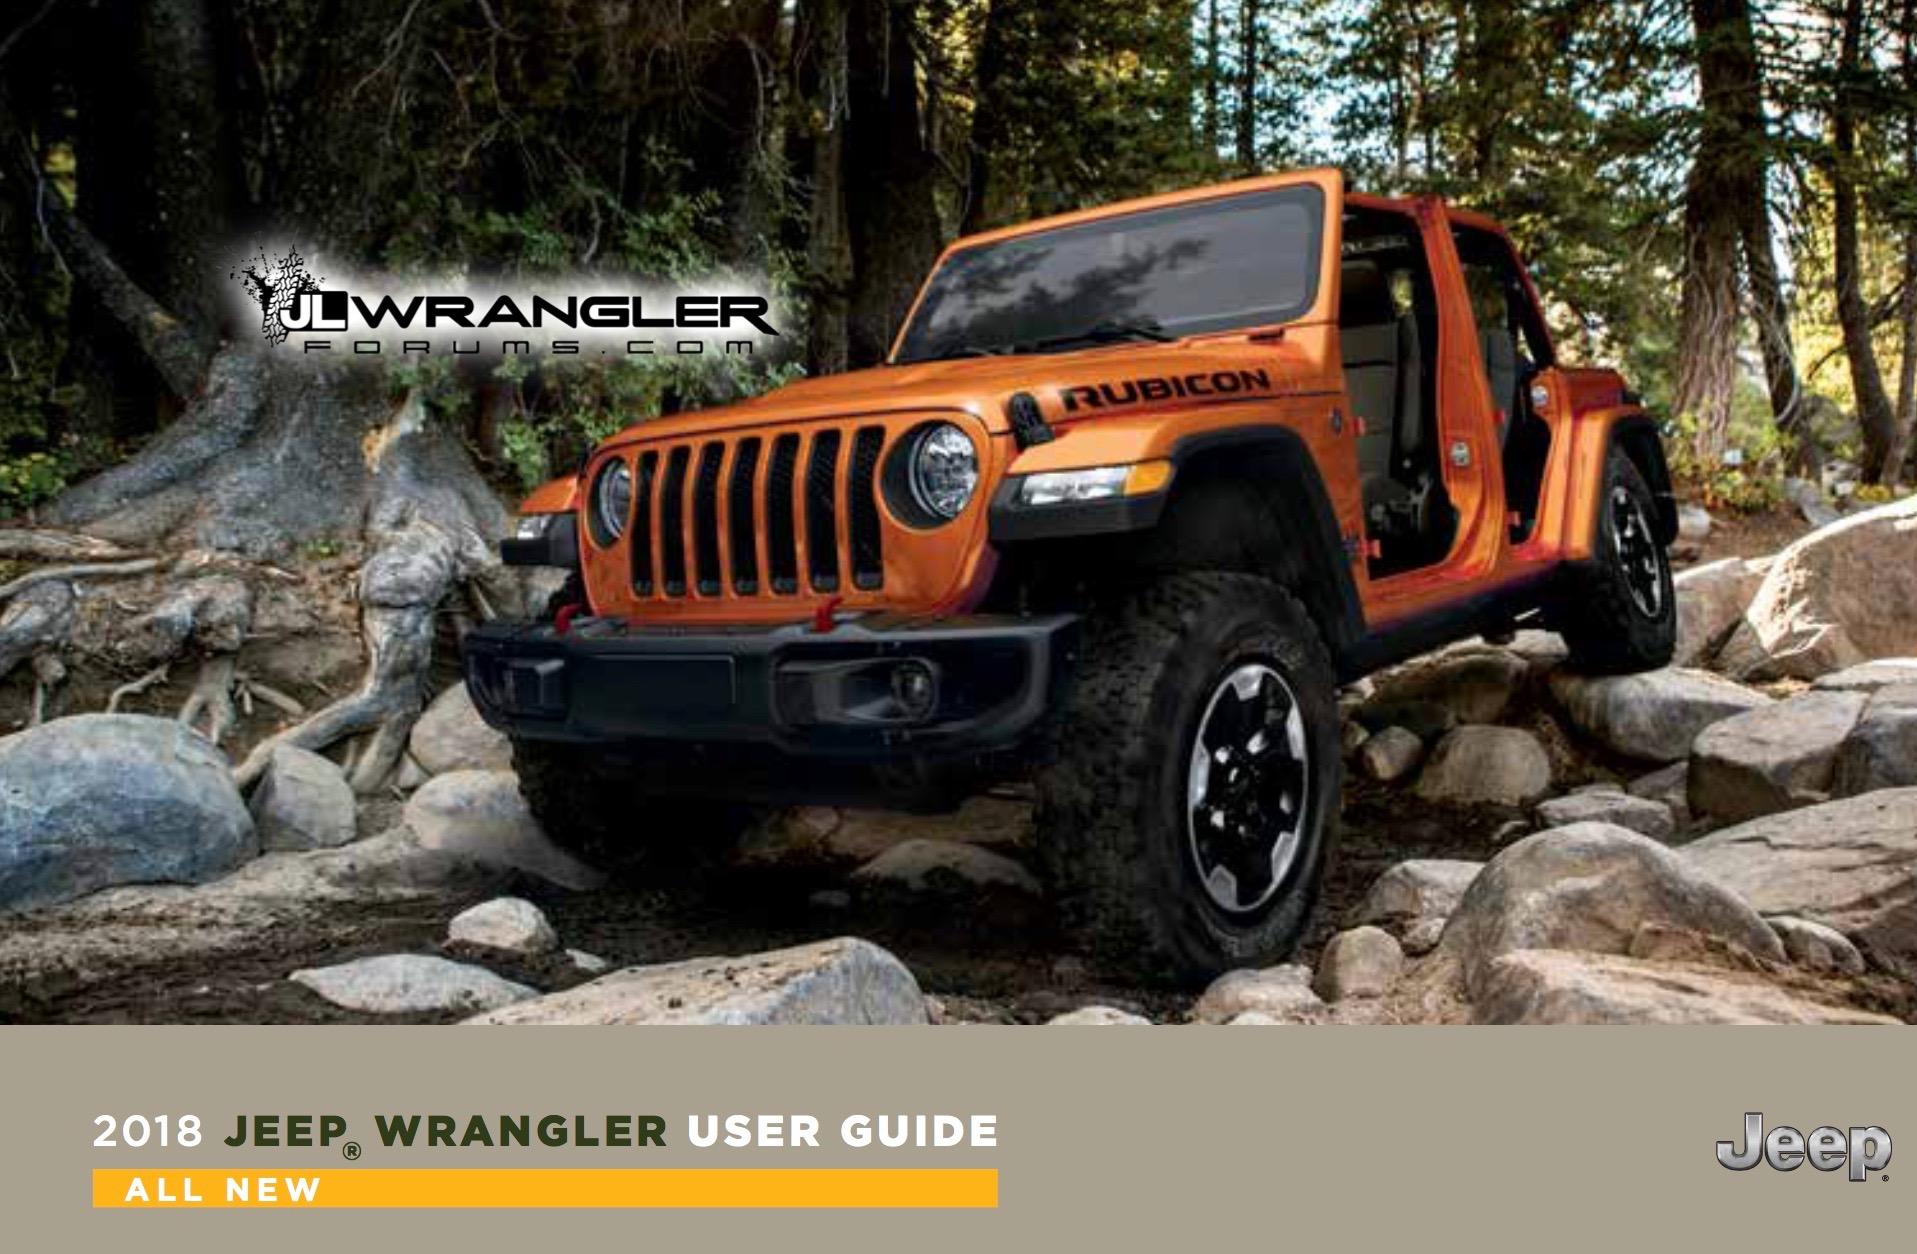 2018 Jeep Wrangler user guide leaked, 2.0L engine confirmed ...